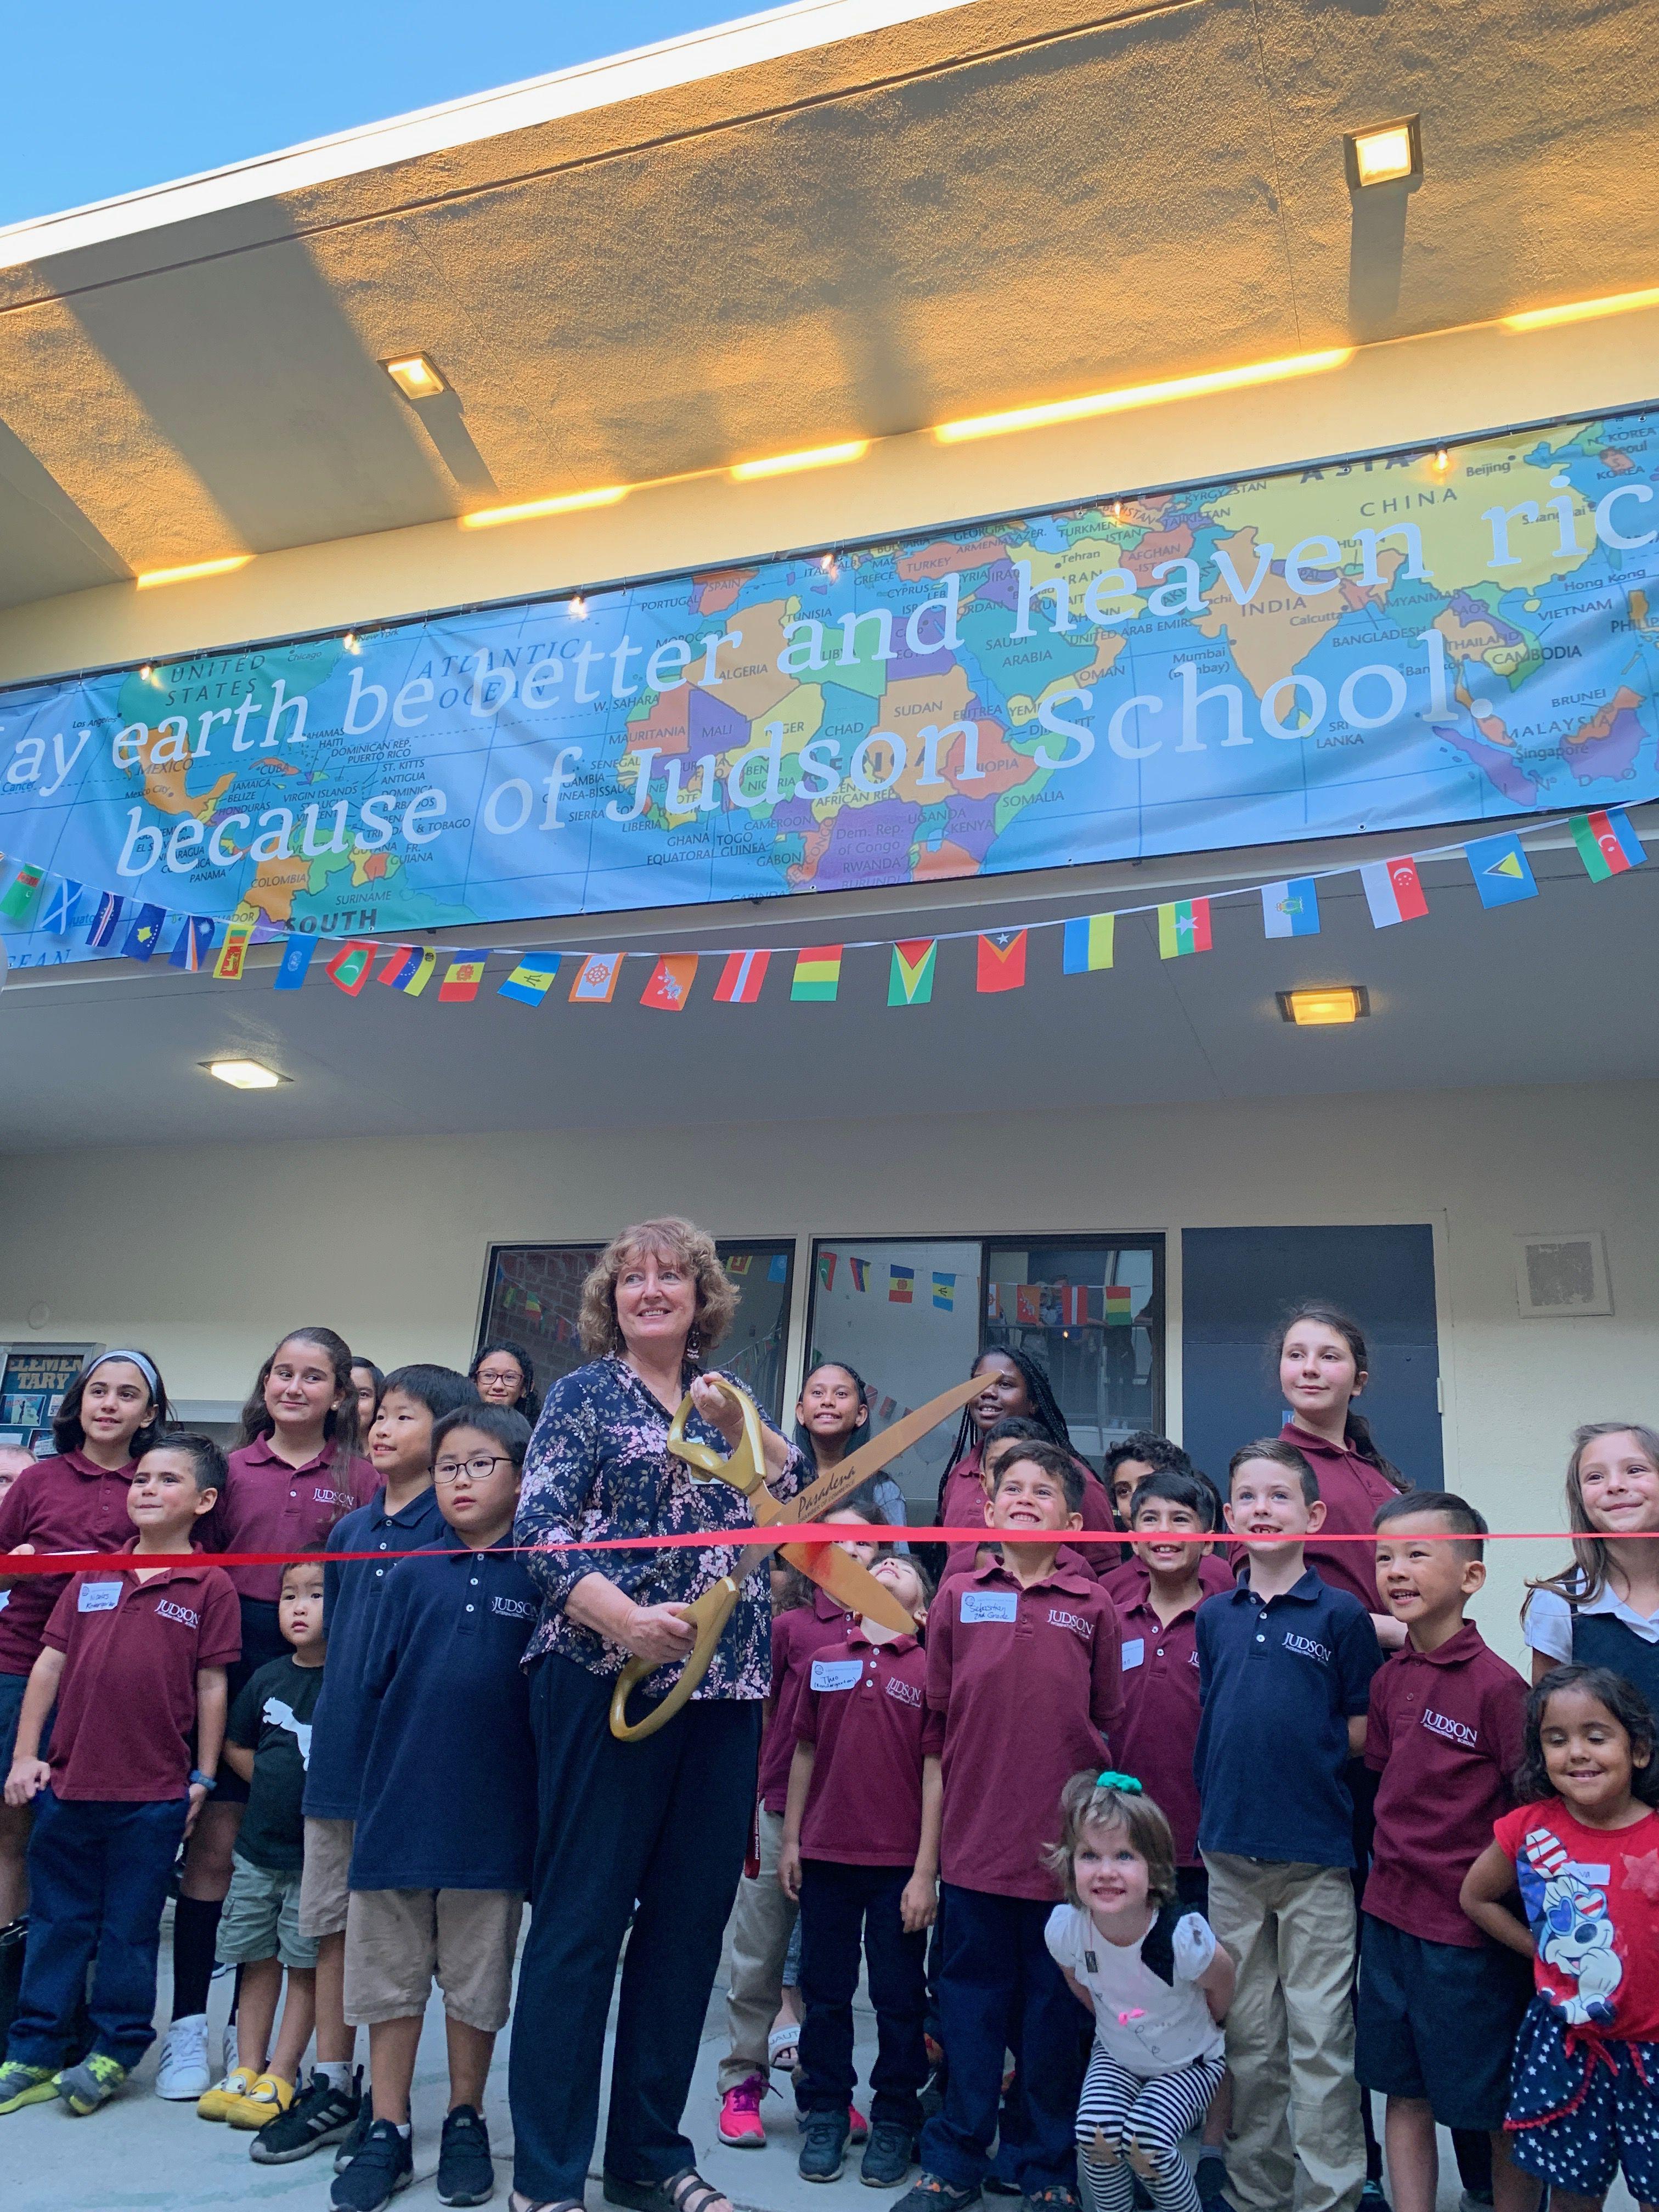 Eagle Rock Grand Opening for Judson International School image 1